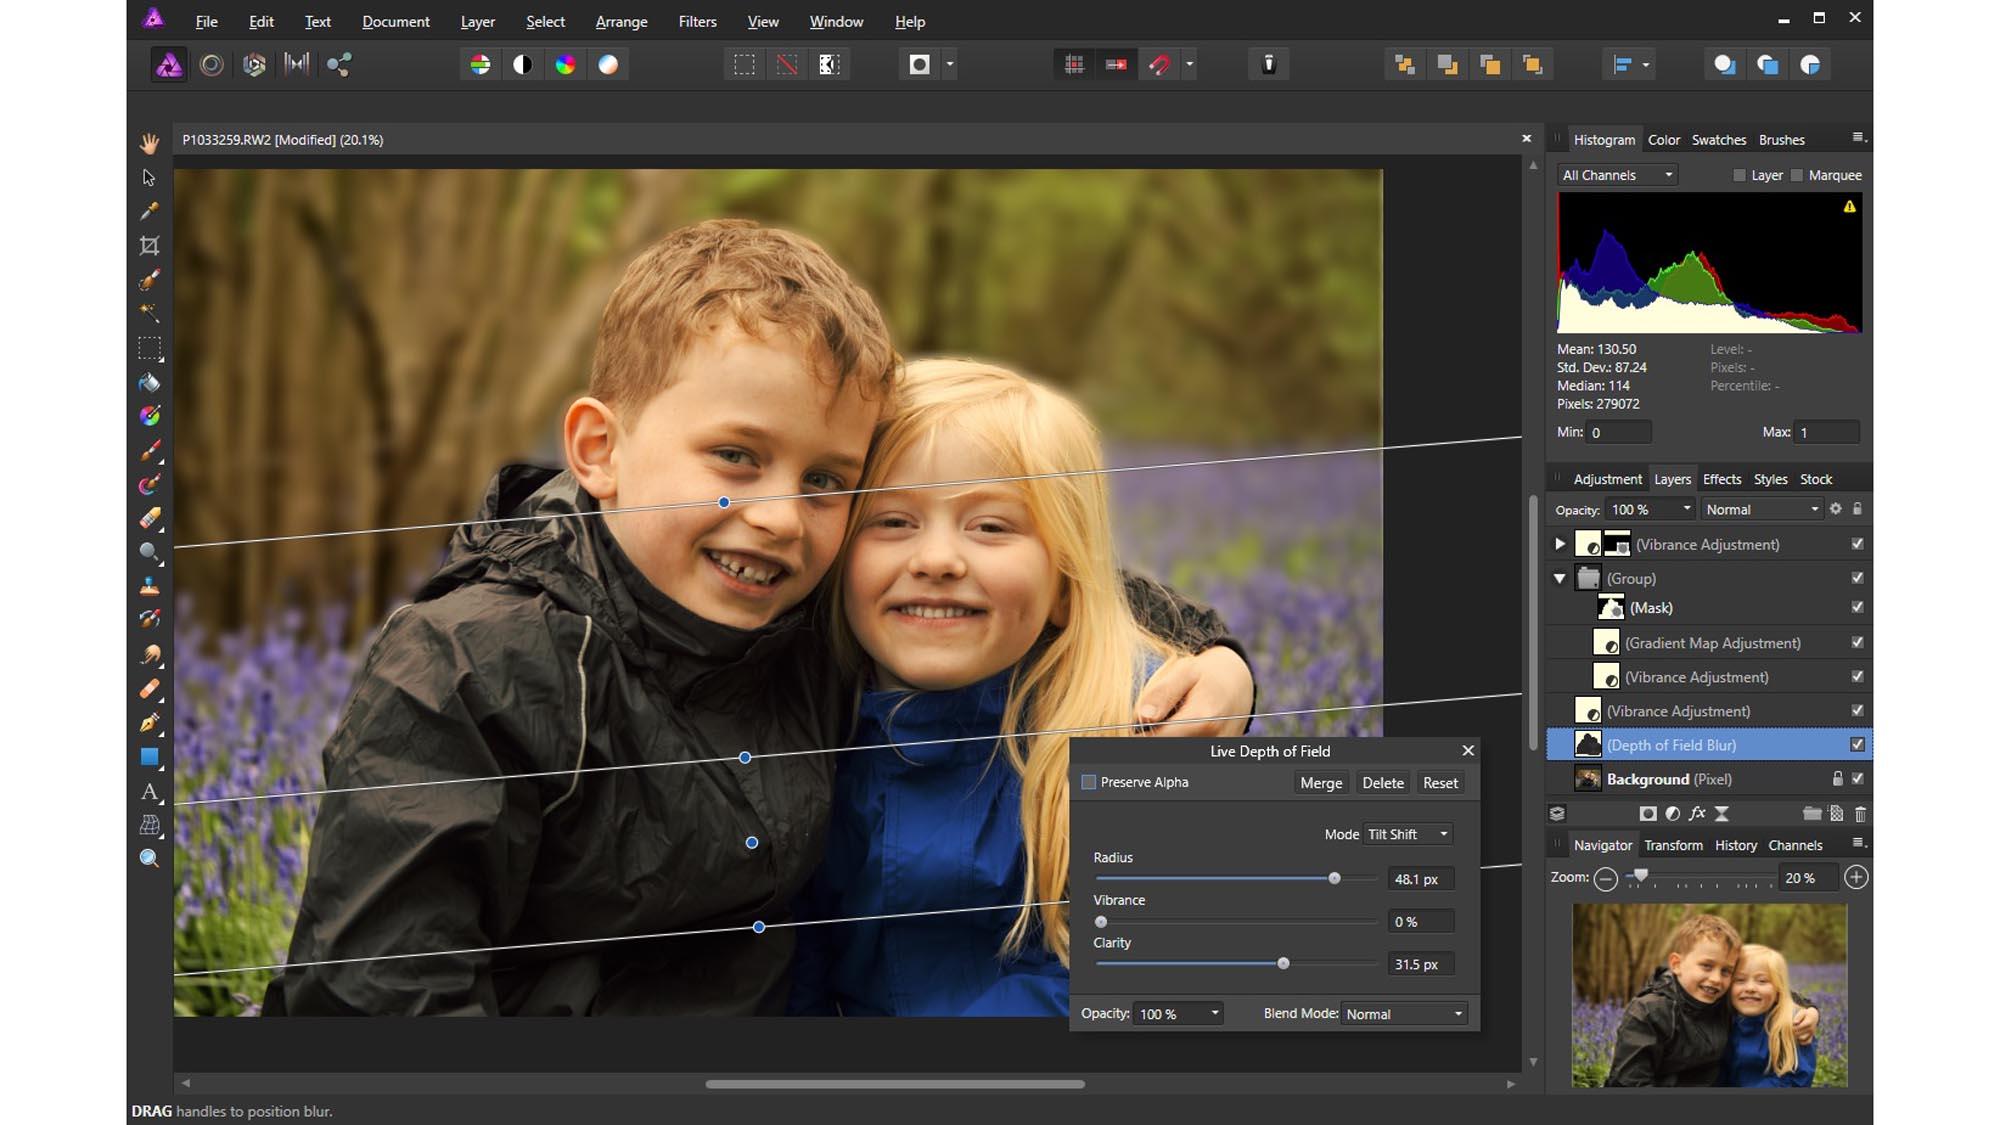 special image editor